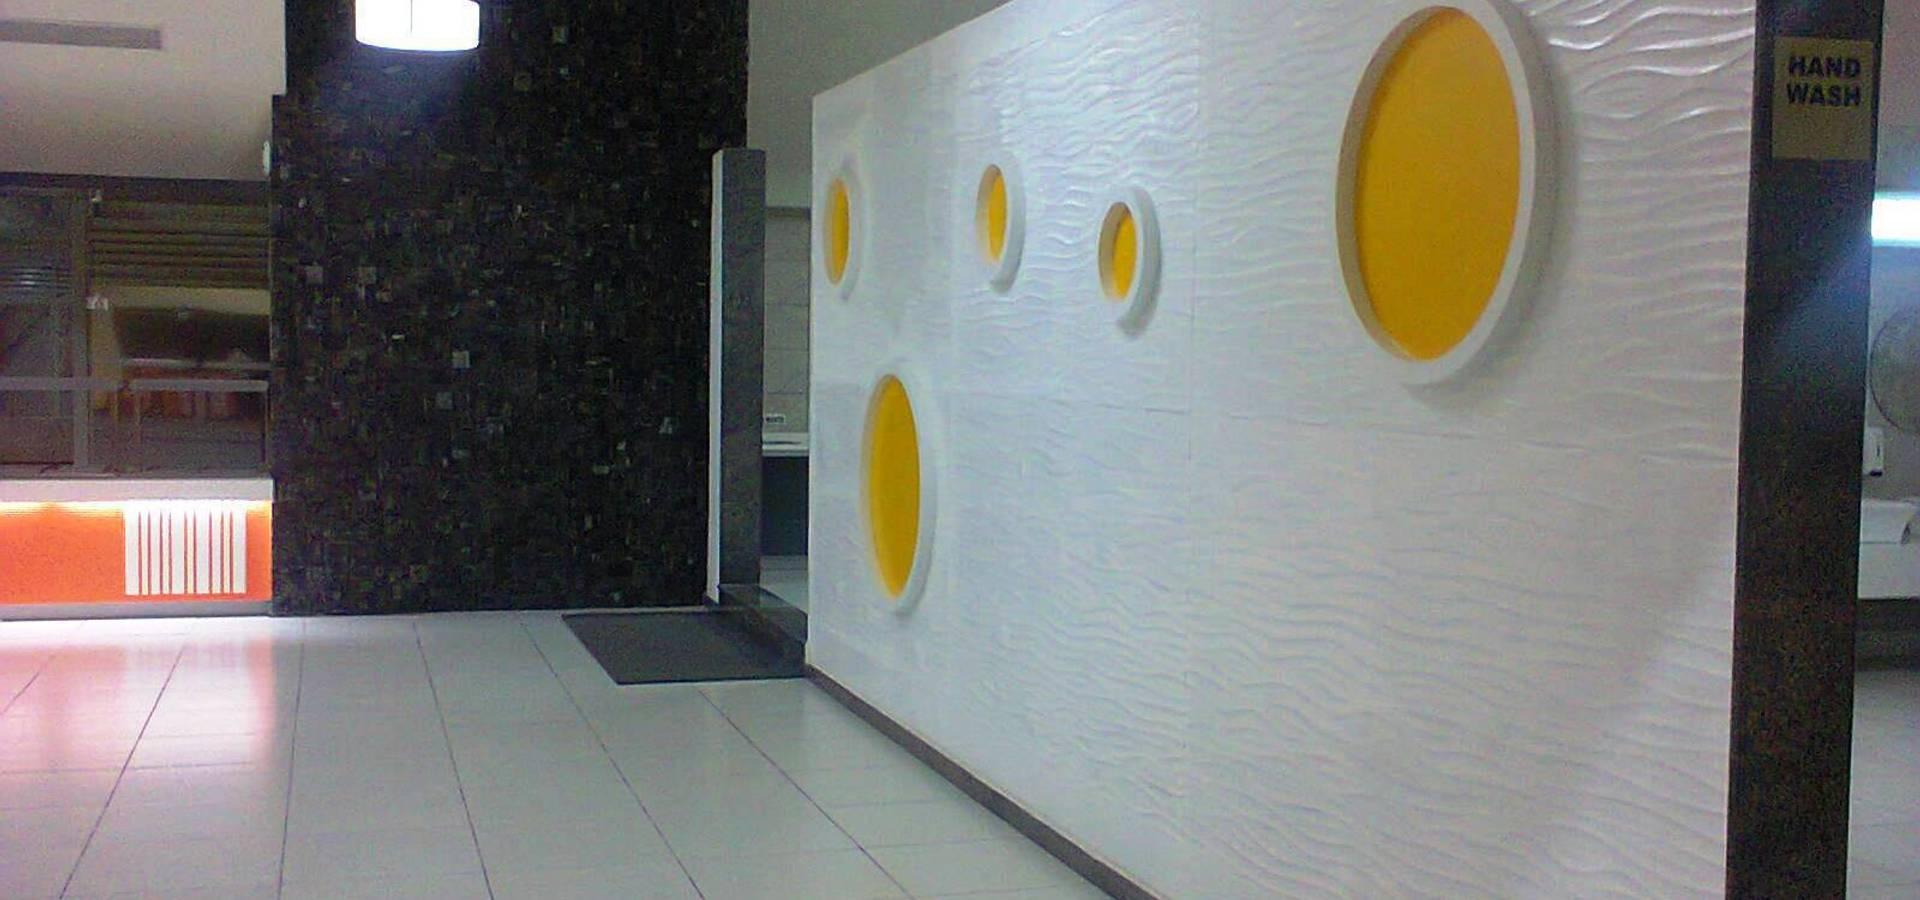 spacedesign